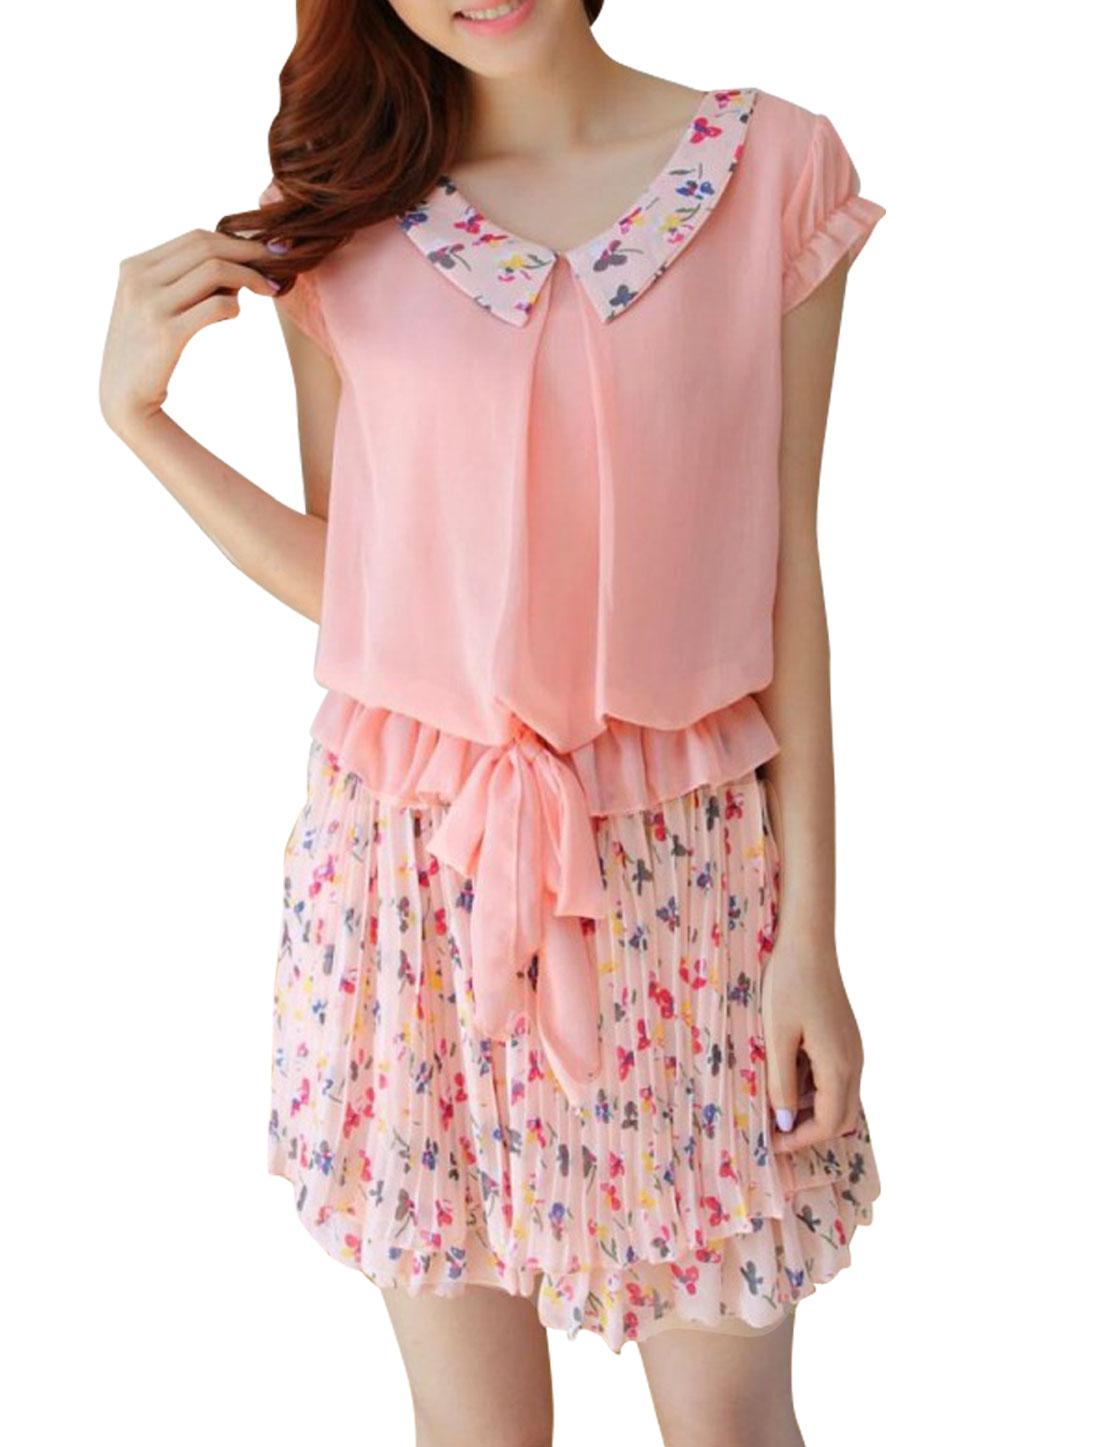 Ladies Doll Collar Ruffled Cap Sleeve Floral Prings Splice Pink Mini Dress S